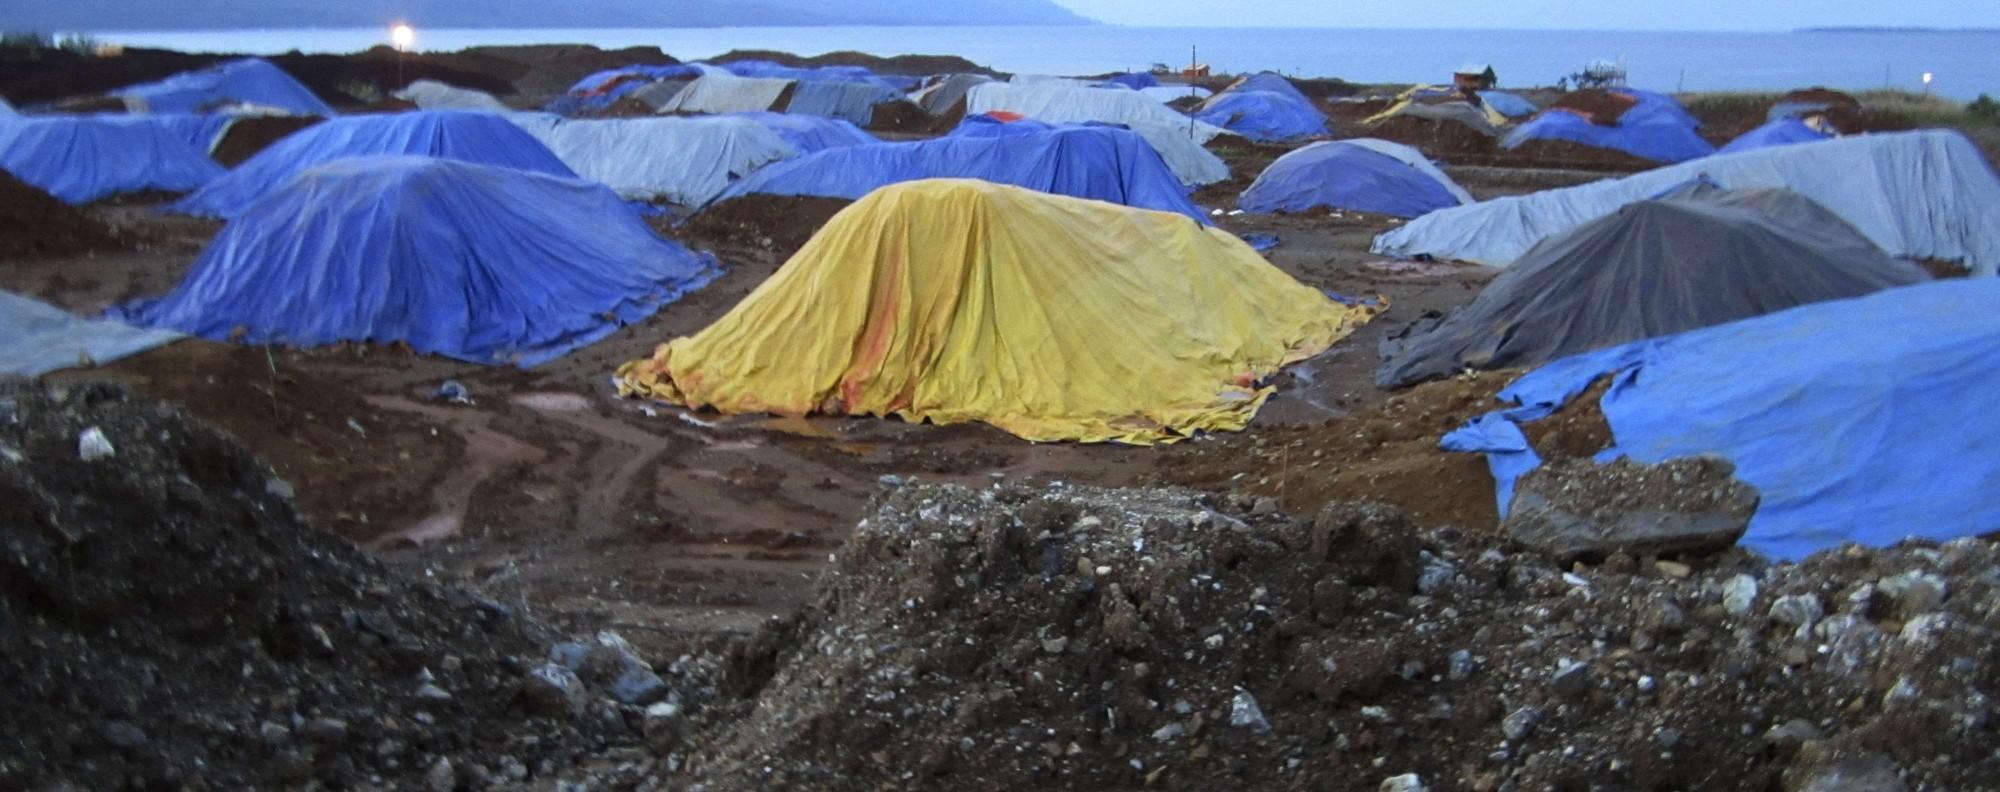 Stockpiles of nickel ore in Indonesia. Photo: Reuters